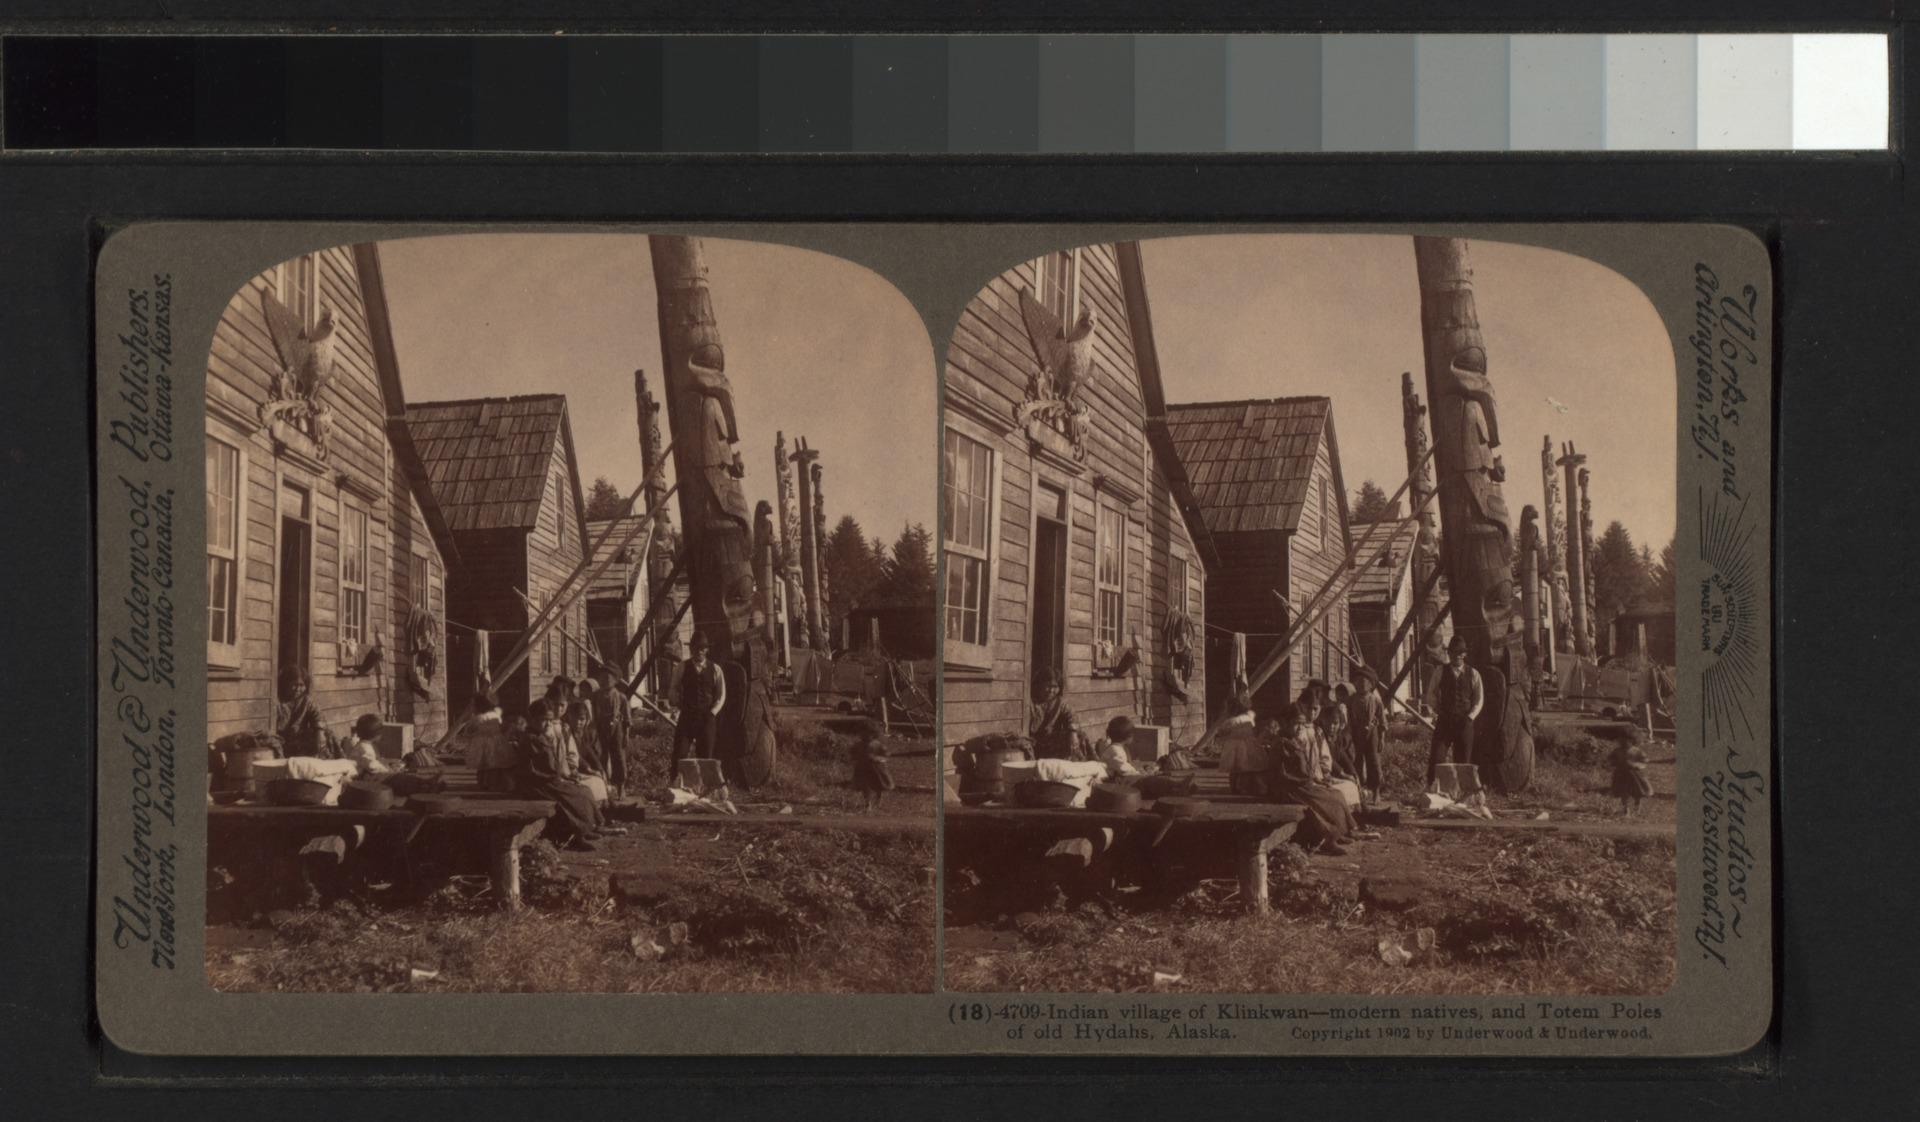 Lossy Page Px Indian Village Of Klinkwan Modern Natives C And Totem Poles Of Old Hydahs C Alaska Nypl B G F F Tif on Haida Indian Villages In Alaska